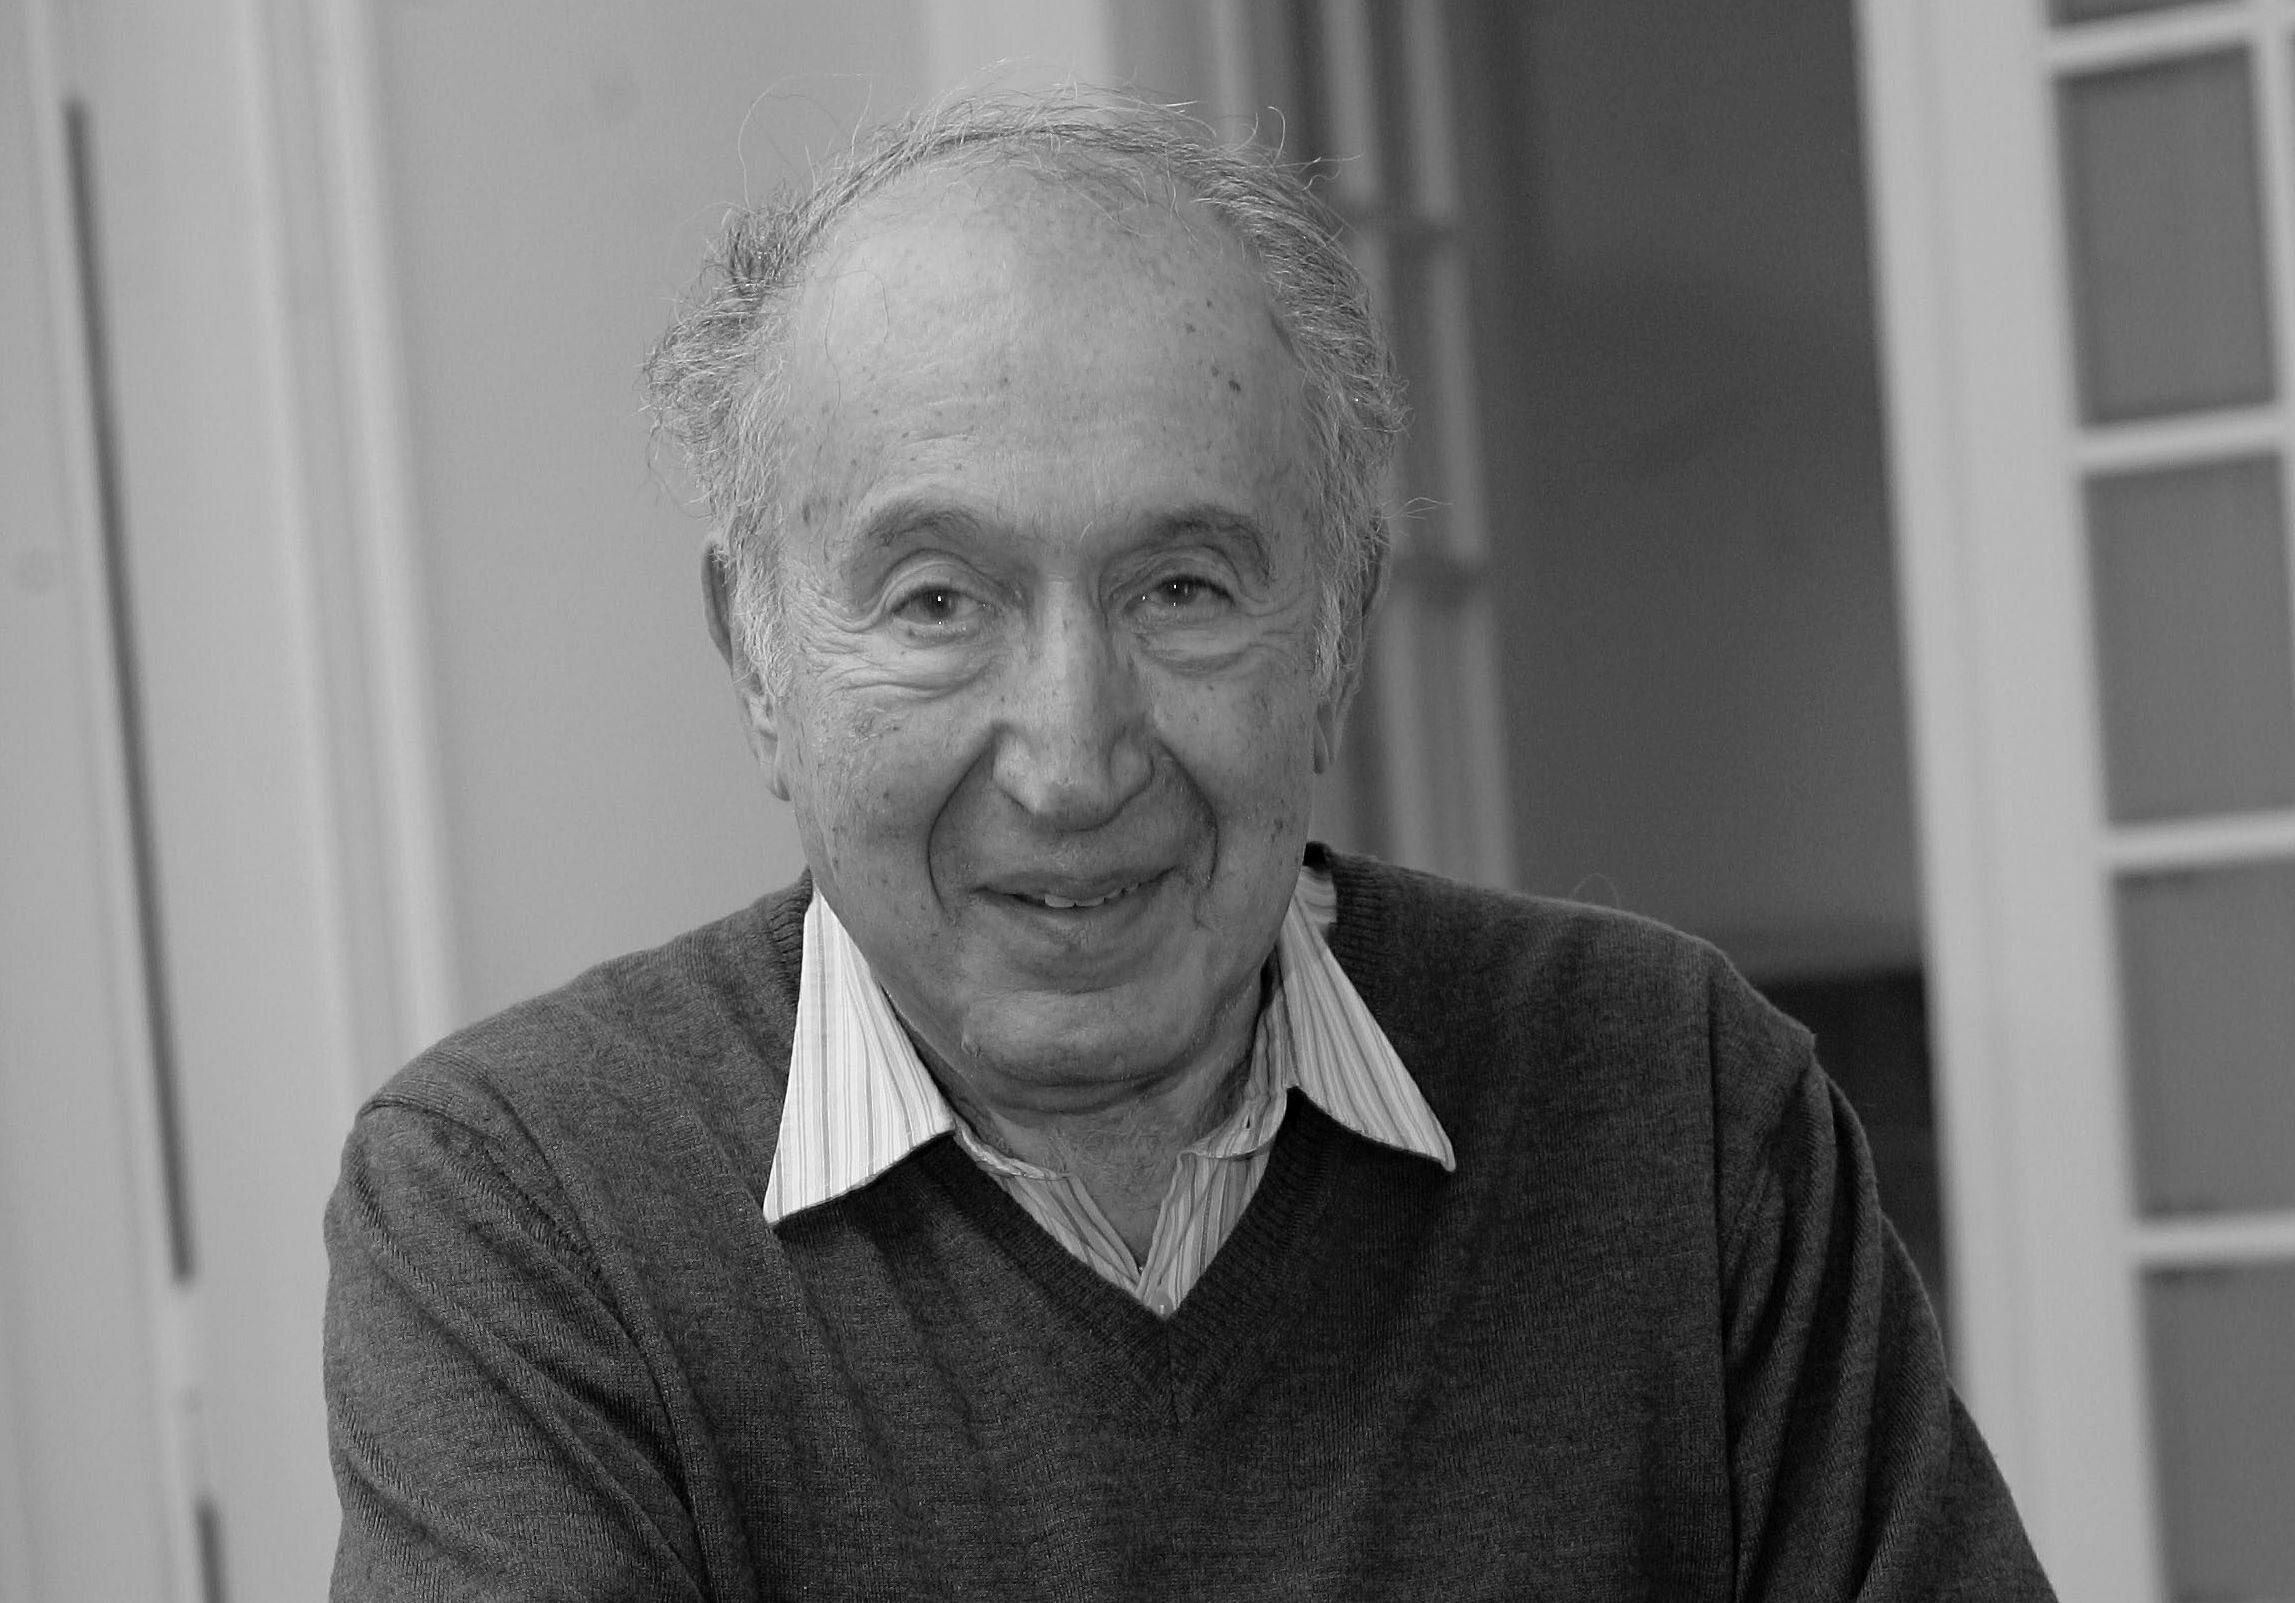 Prof. Richard Pipes